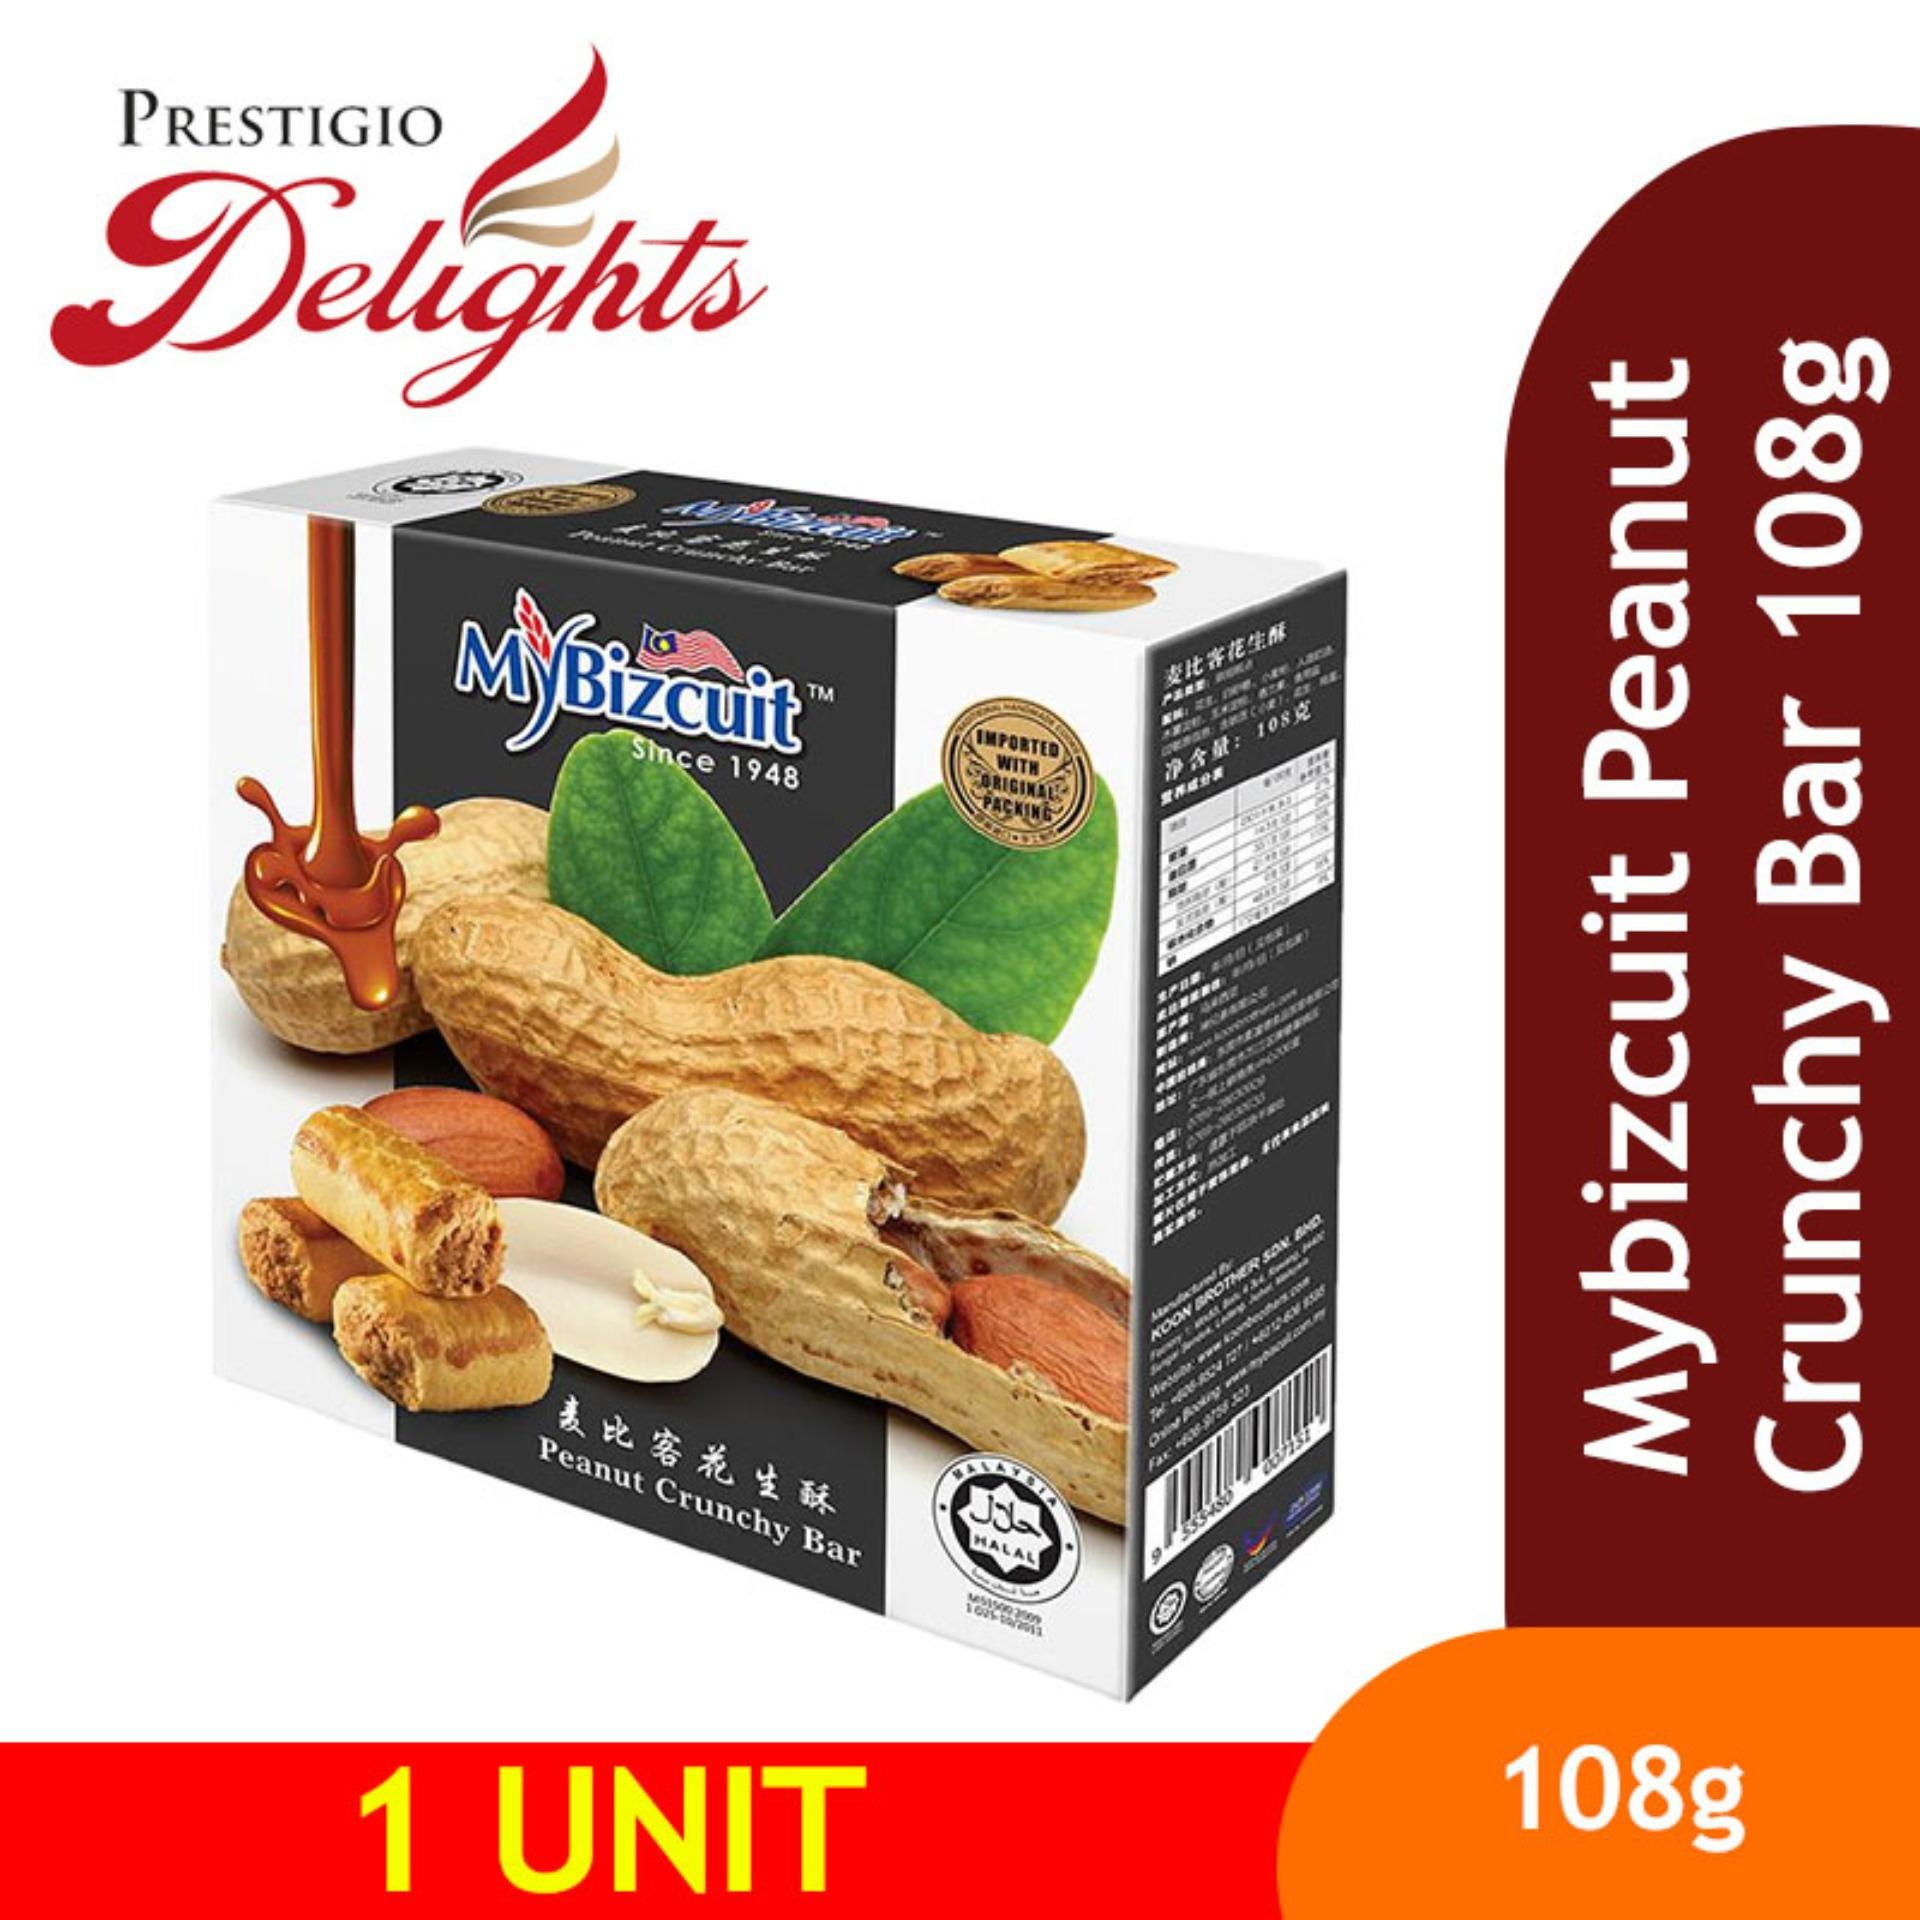 Mybizcuit Peanut Crunchy Bar 108g By Prestigio Delights.